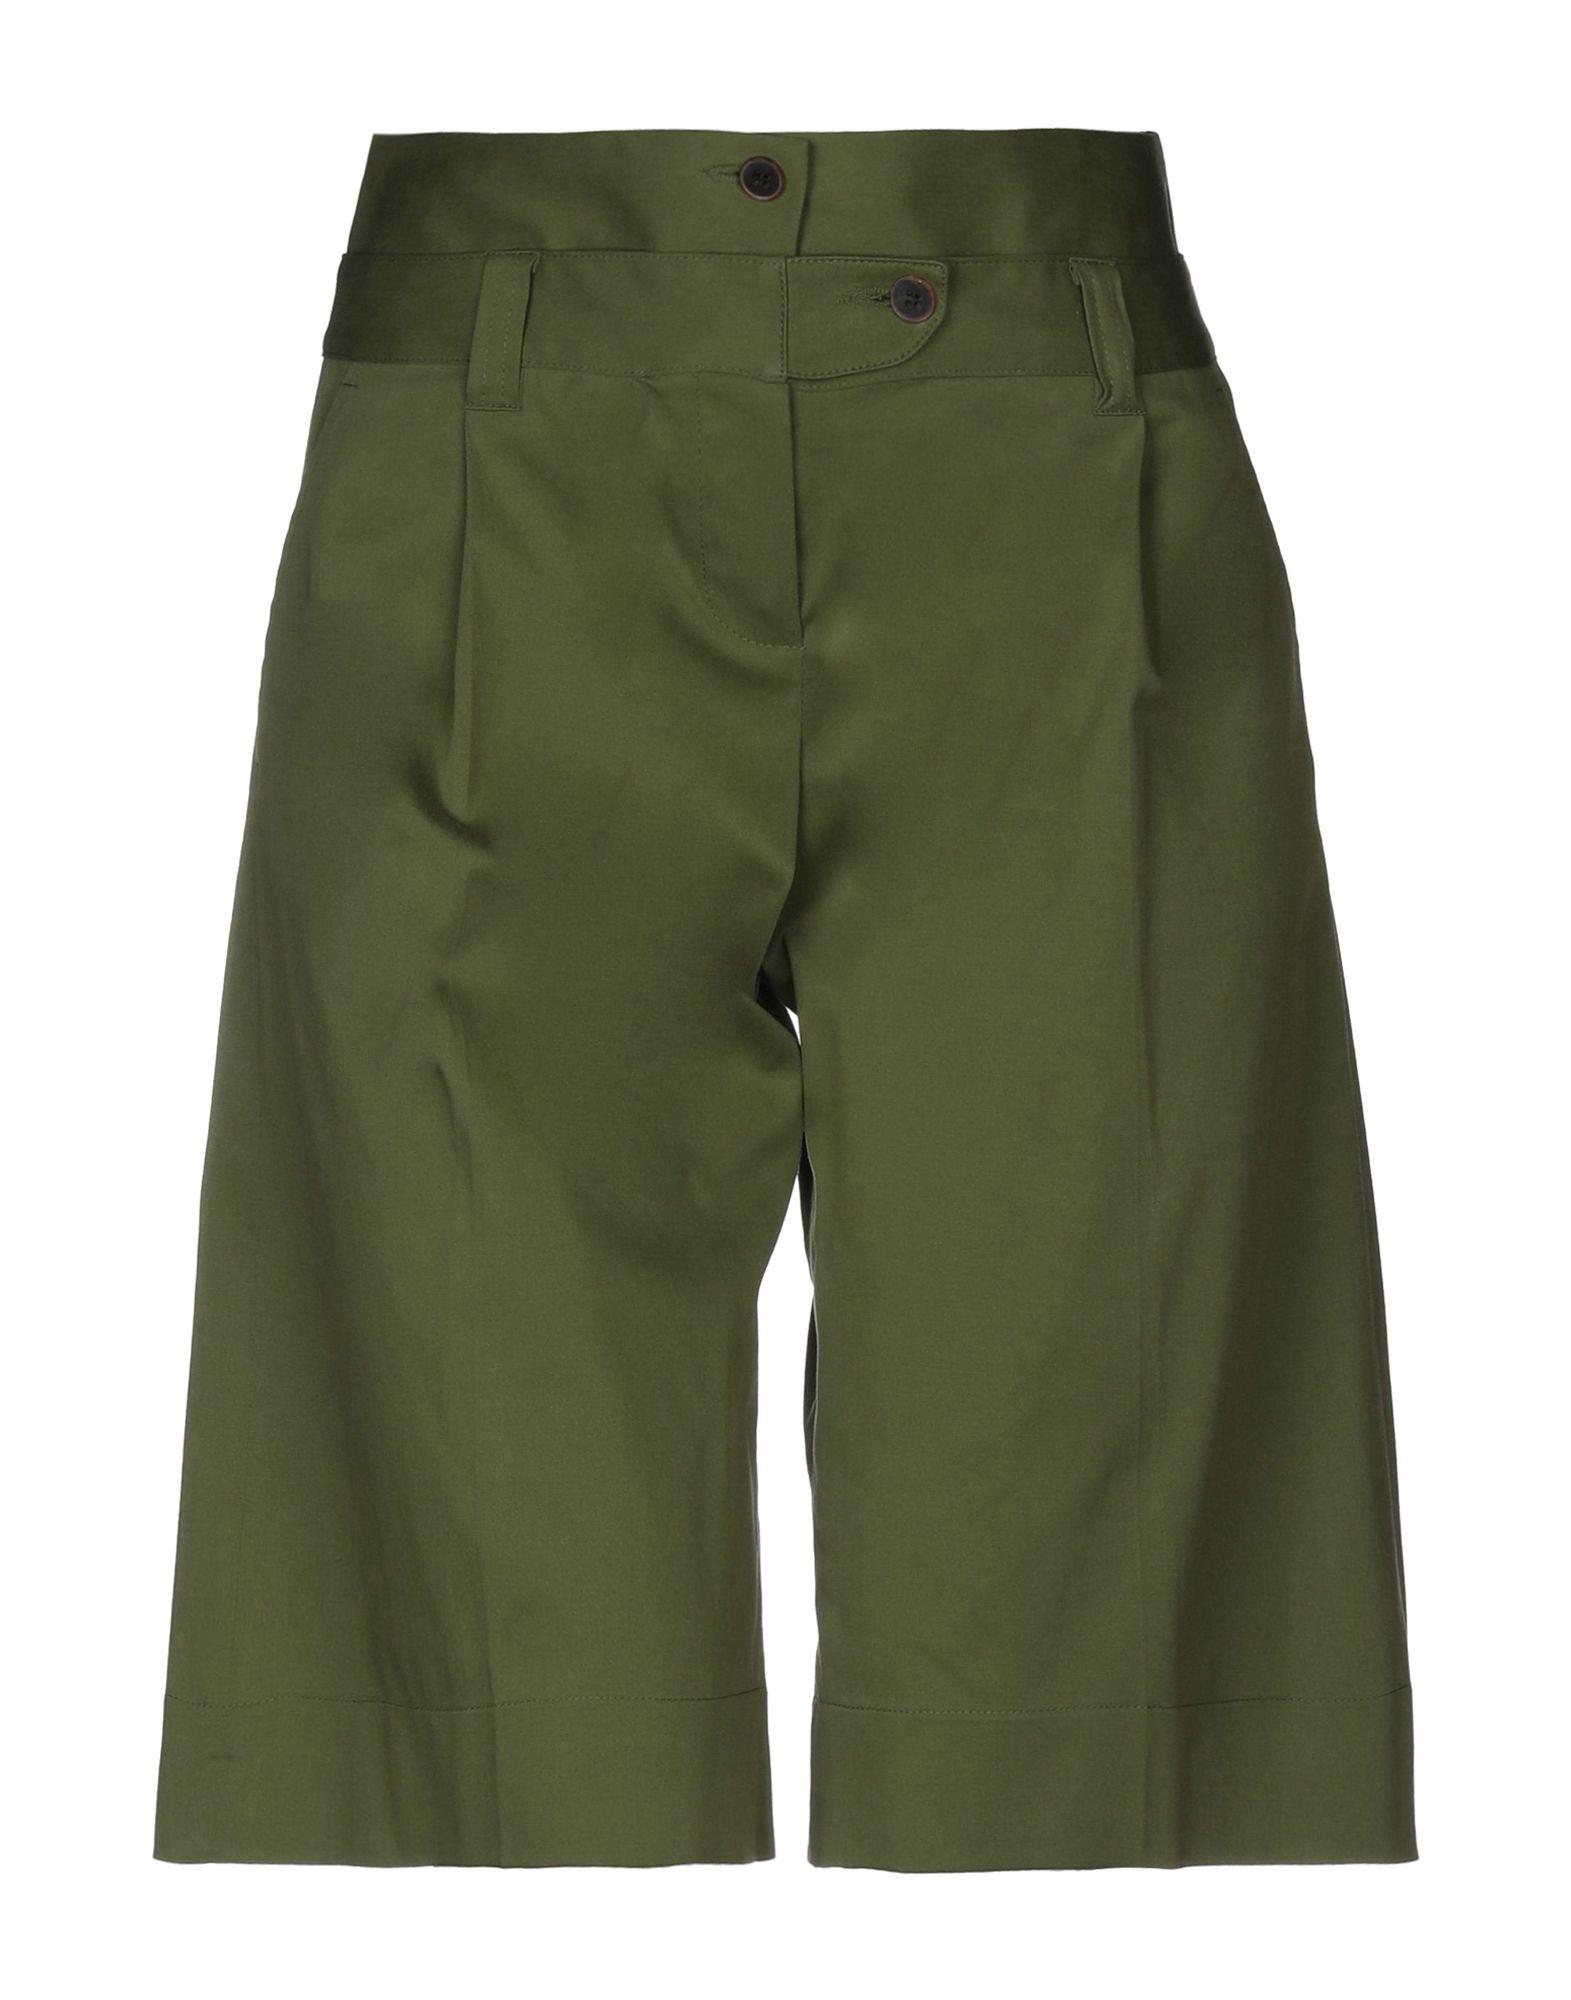 Pantalone Classico Metradamo donna - 13236205AS 13236205AS 13236205AS 3be